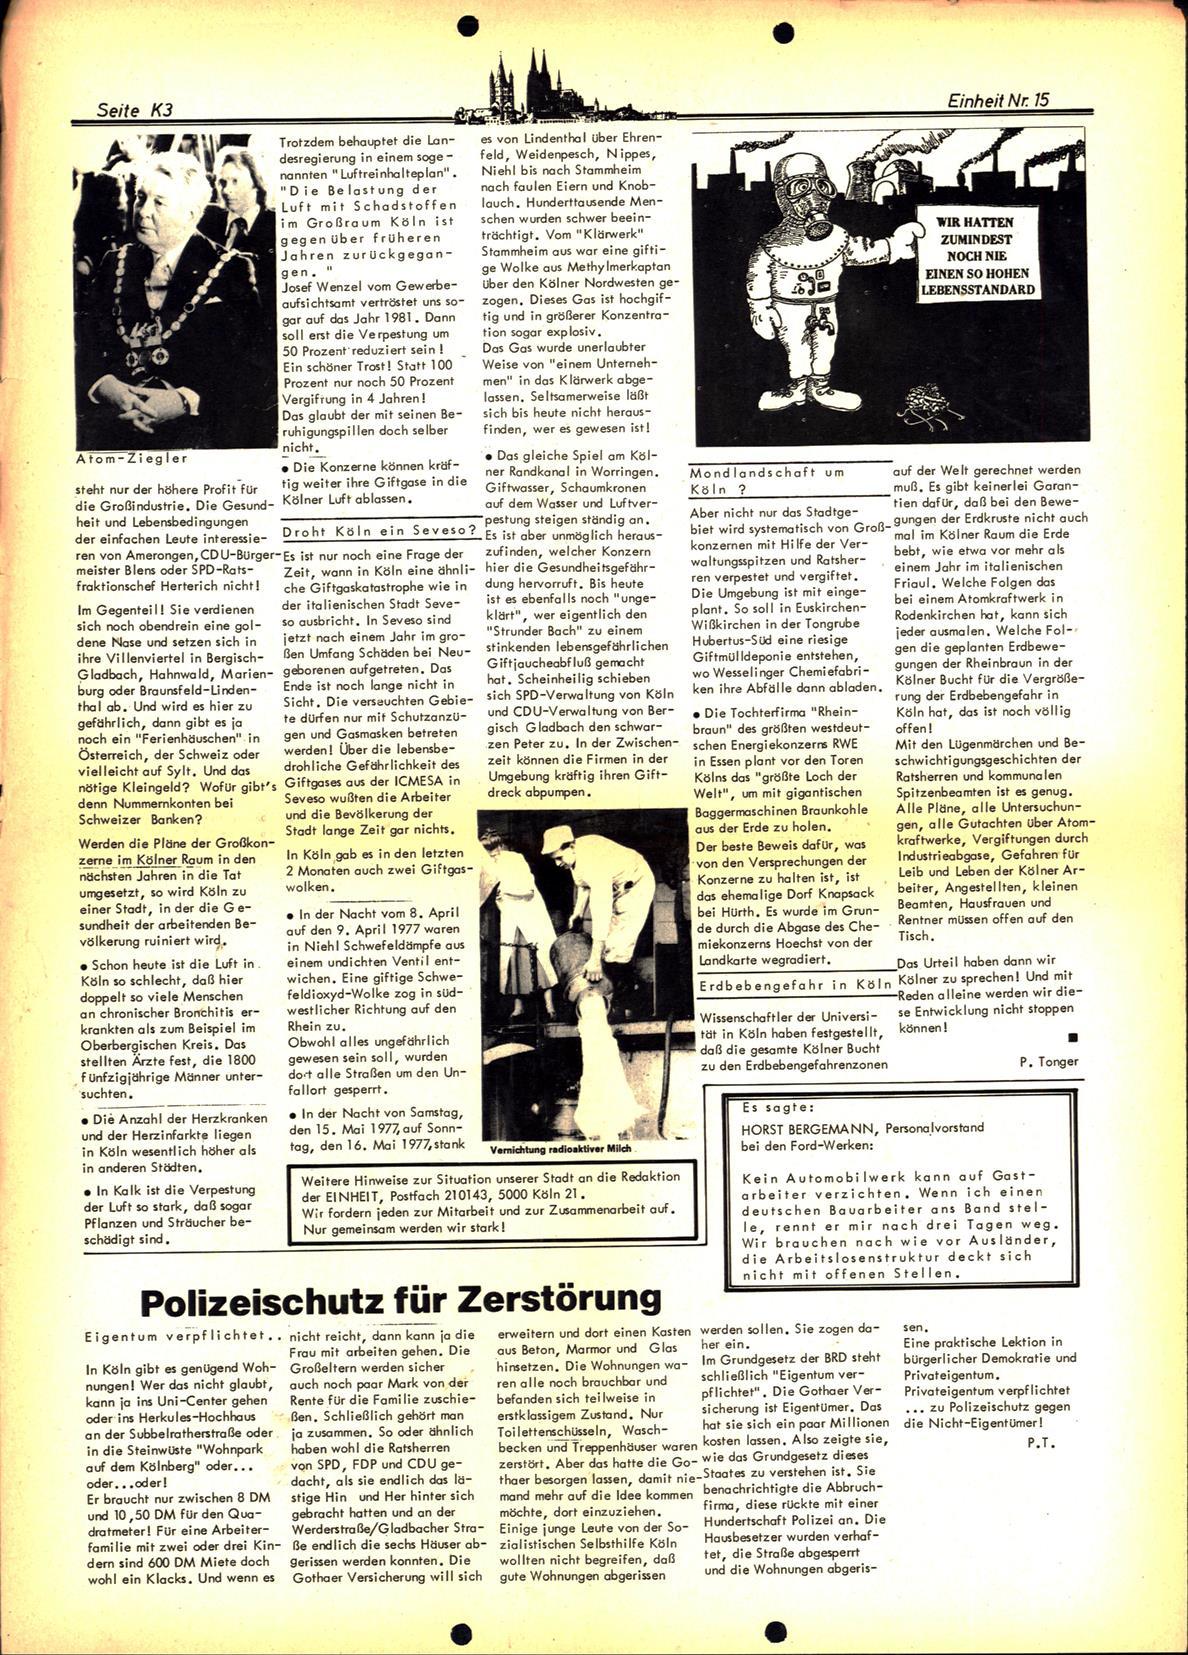 Koeln_IPdA_Einheit_1977_015_Stadt_003